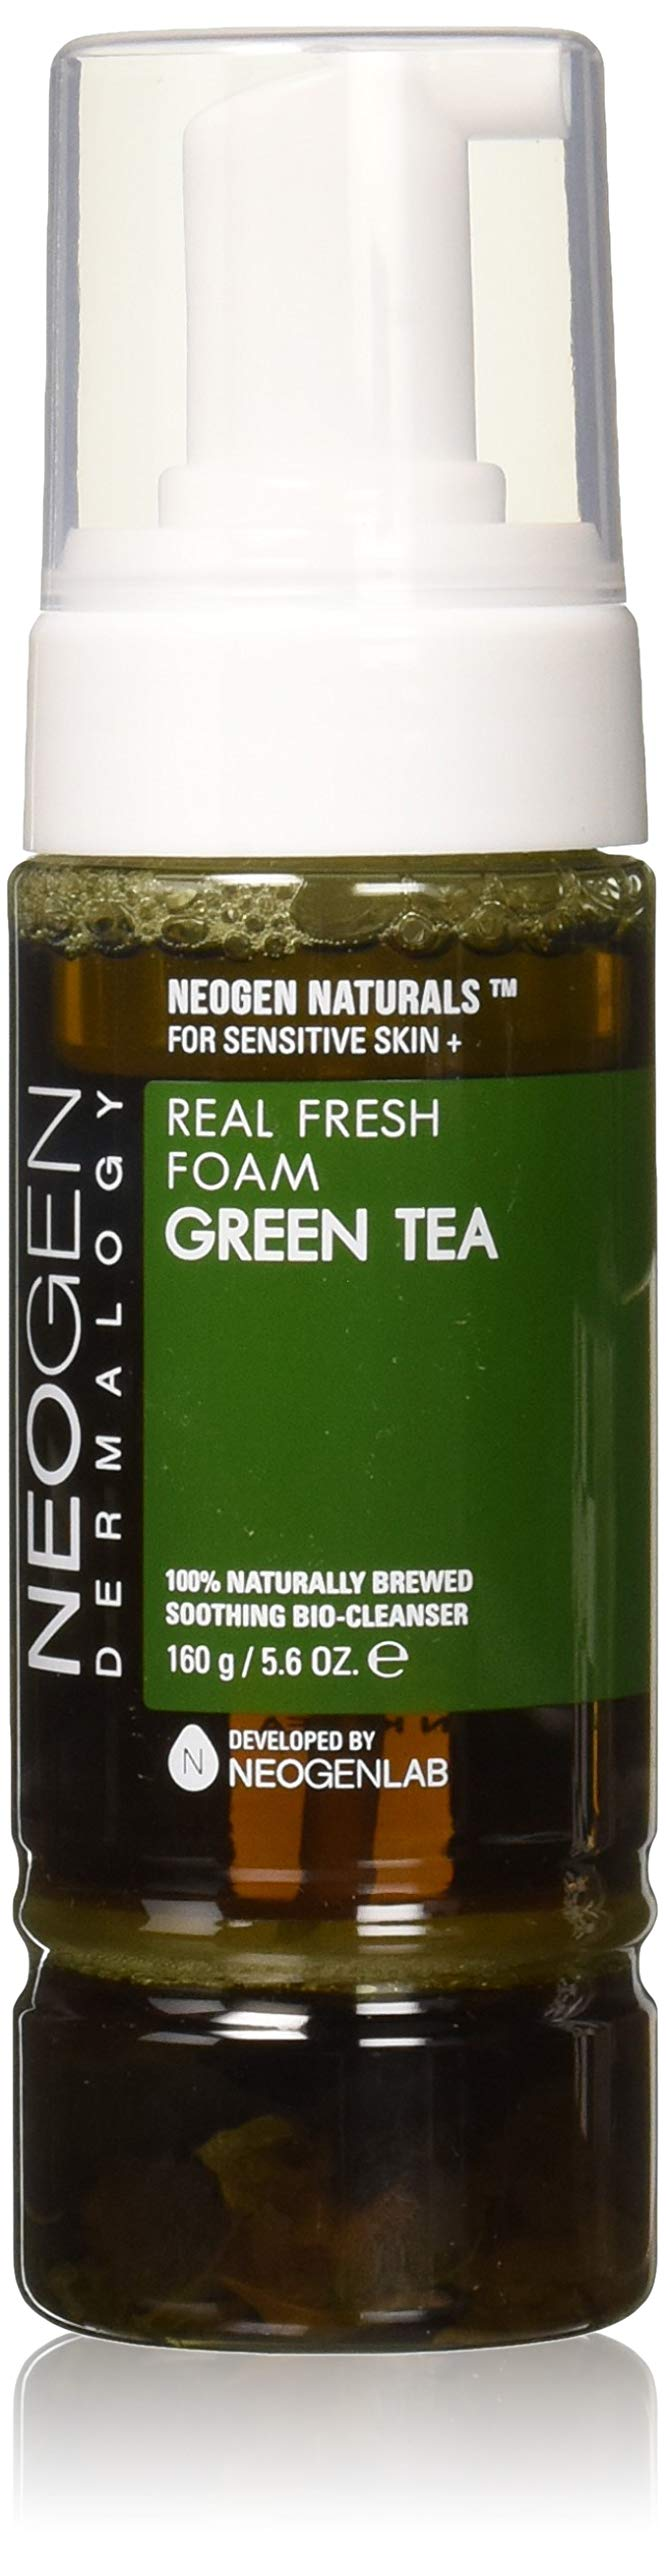 NEOGEN DERMALOGY REAL FRESH FOAM CLEANSER GREEN TEA 5.6 oz / 160g by Neogen